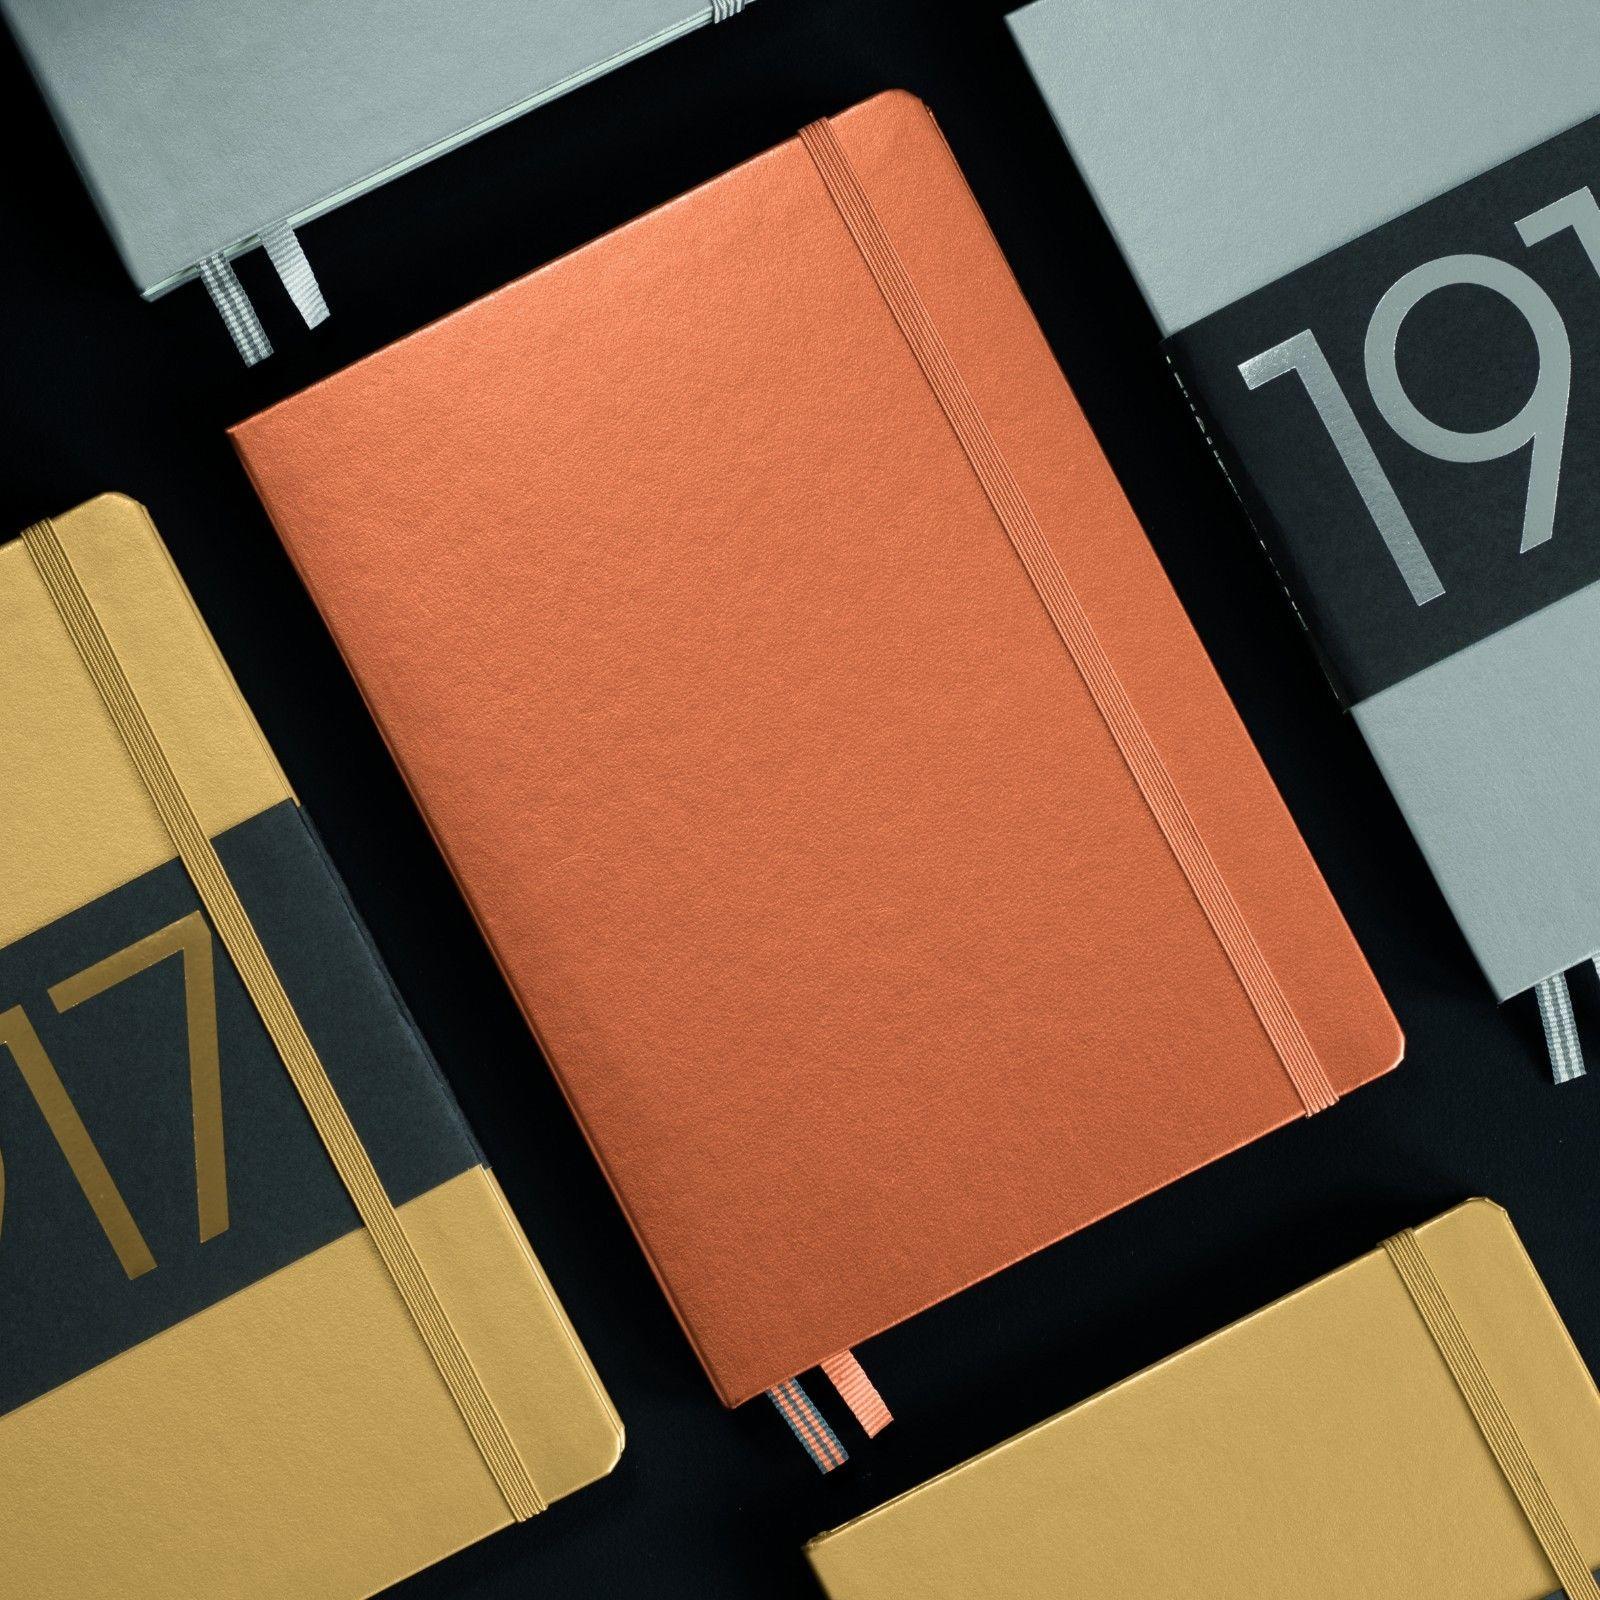 Leuchtturm1917-100Years-Metallic-Edition-A6-Hardback-Notebook-Gold-Silver-Copper-152488682213-3